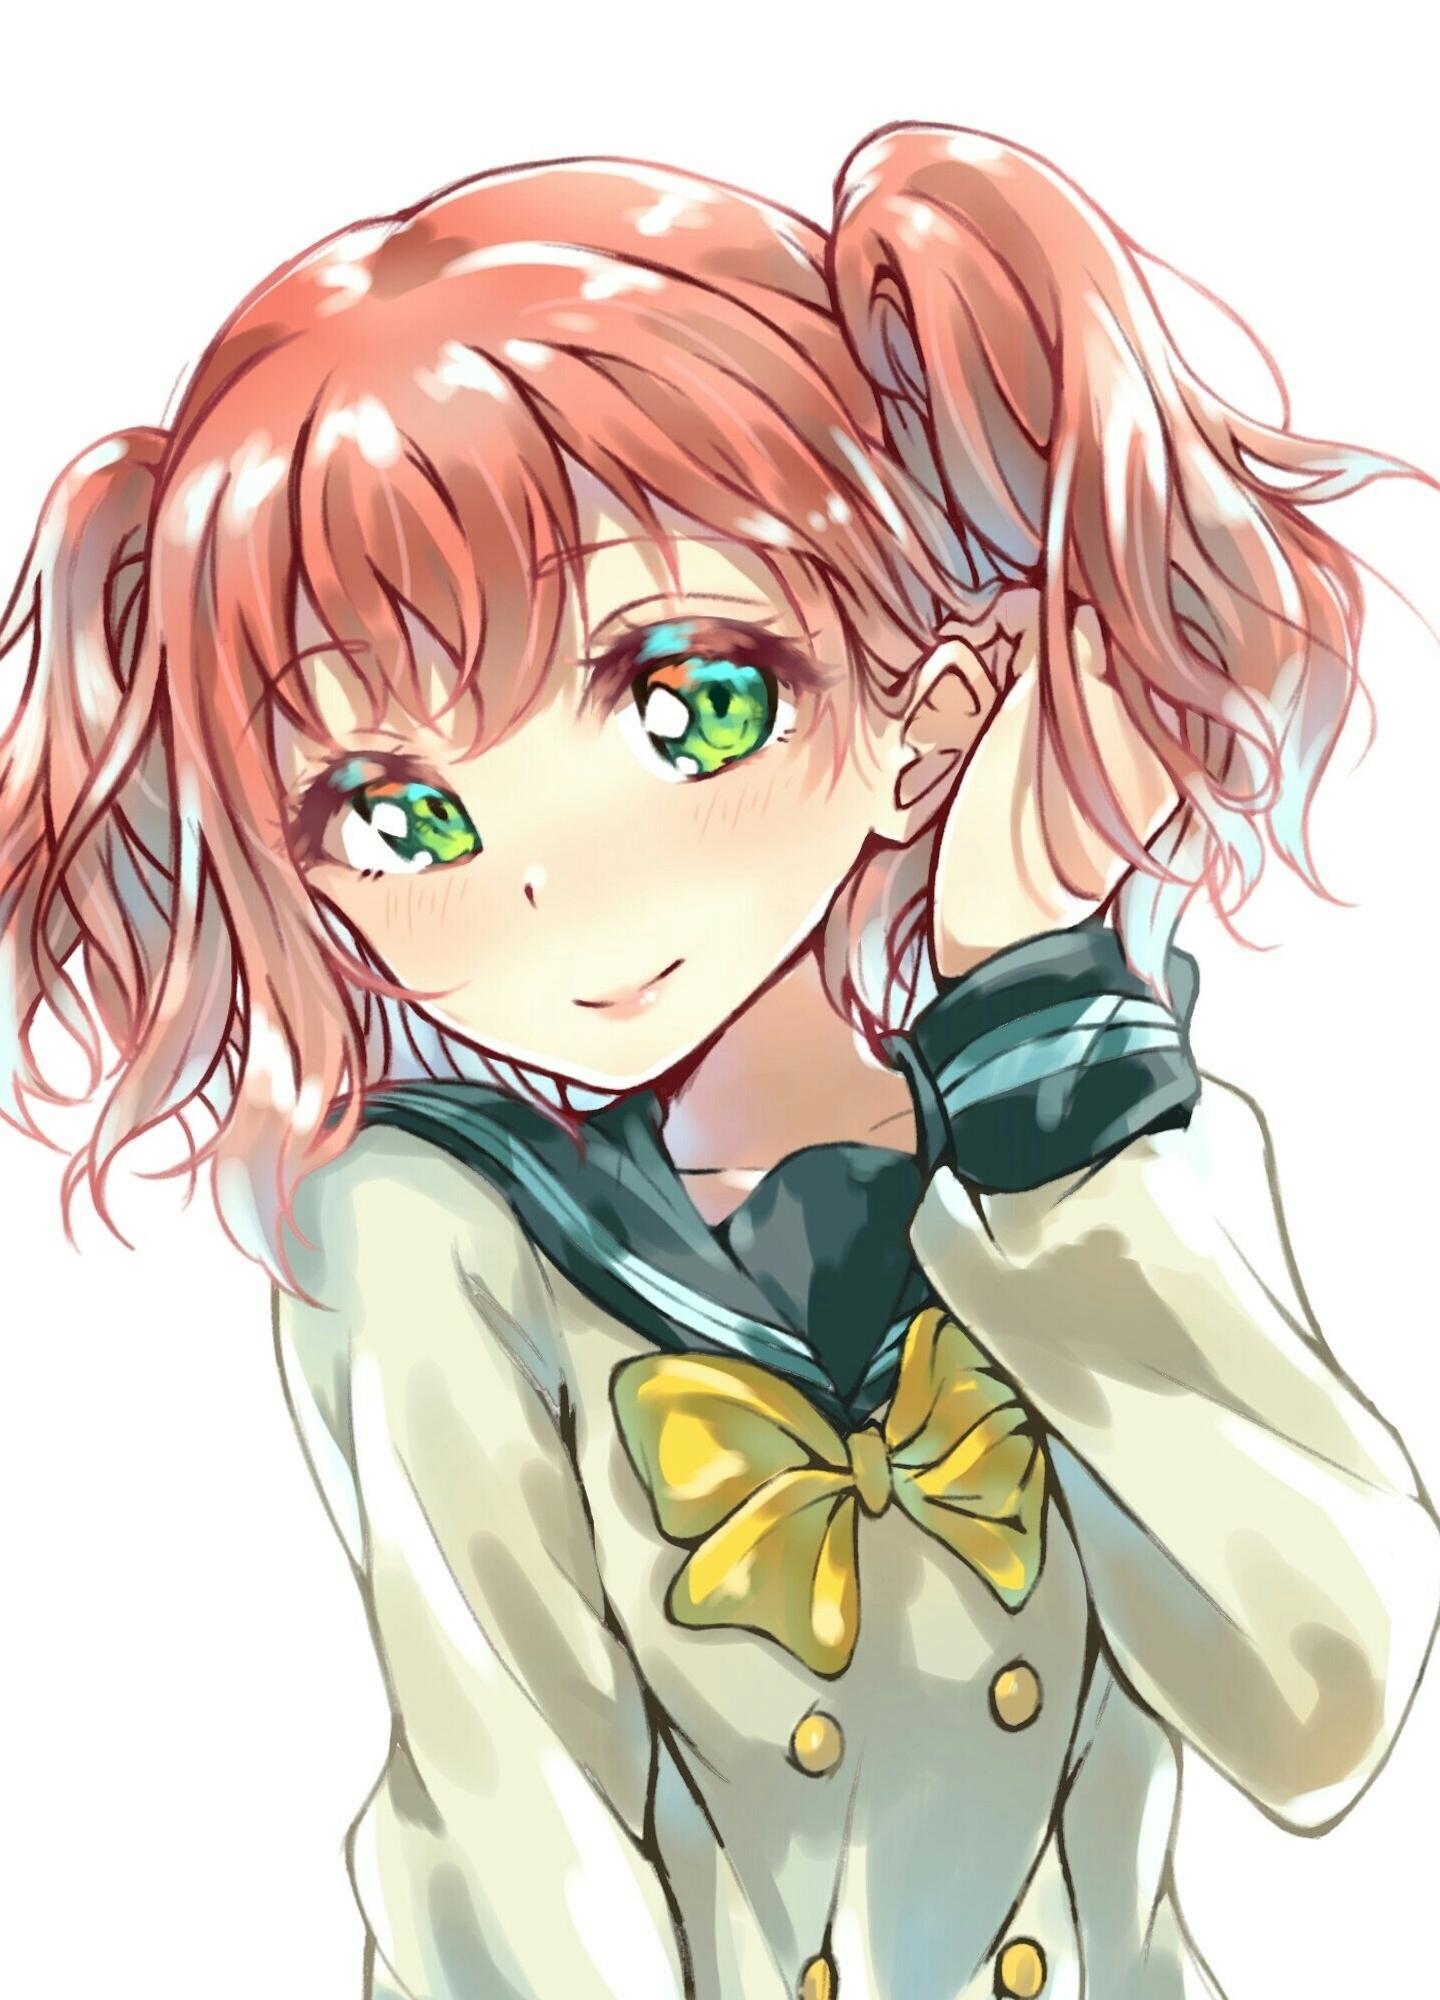 Download 1440x2880 Wallpaper Shy Love Live Ruby Kurosawa Anime Girl Lg V30 G6 Hd Image Background 6516